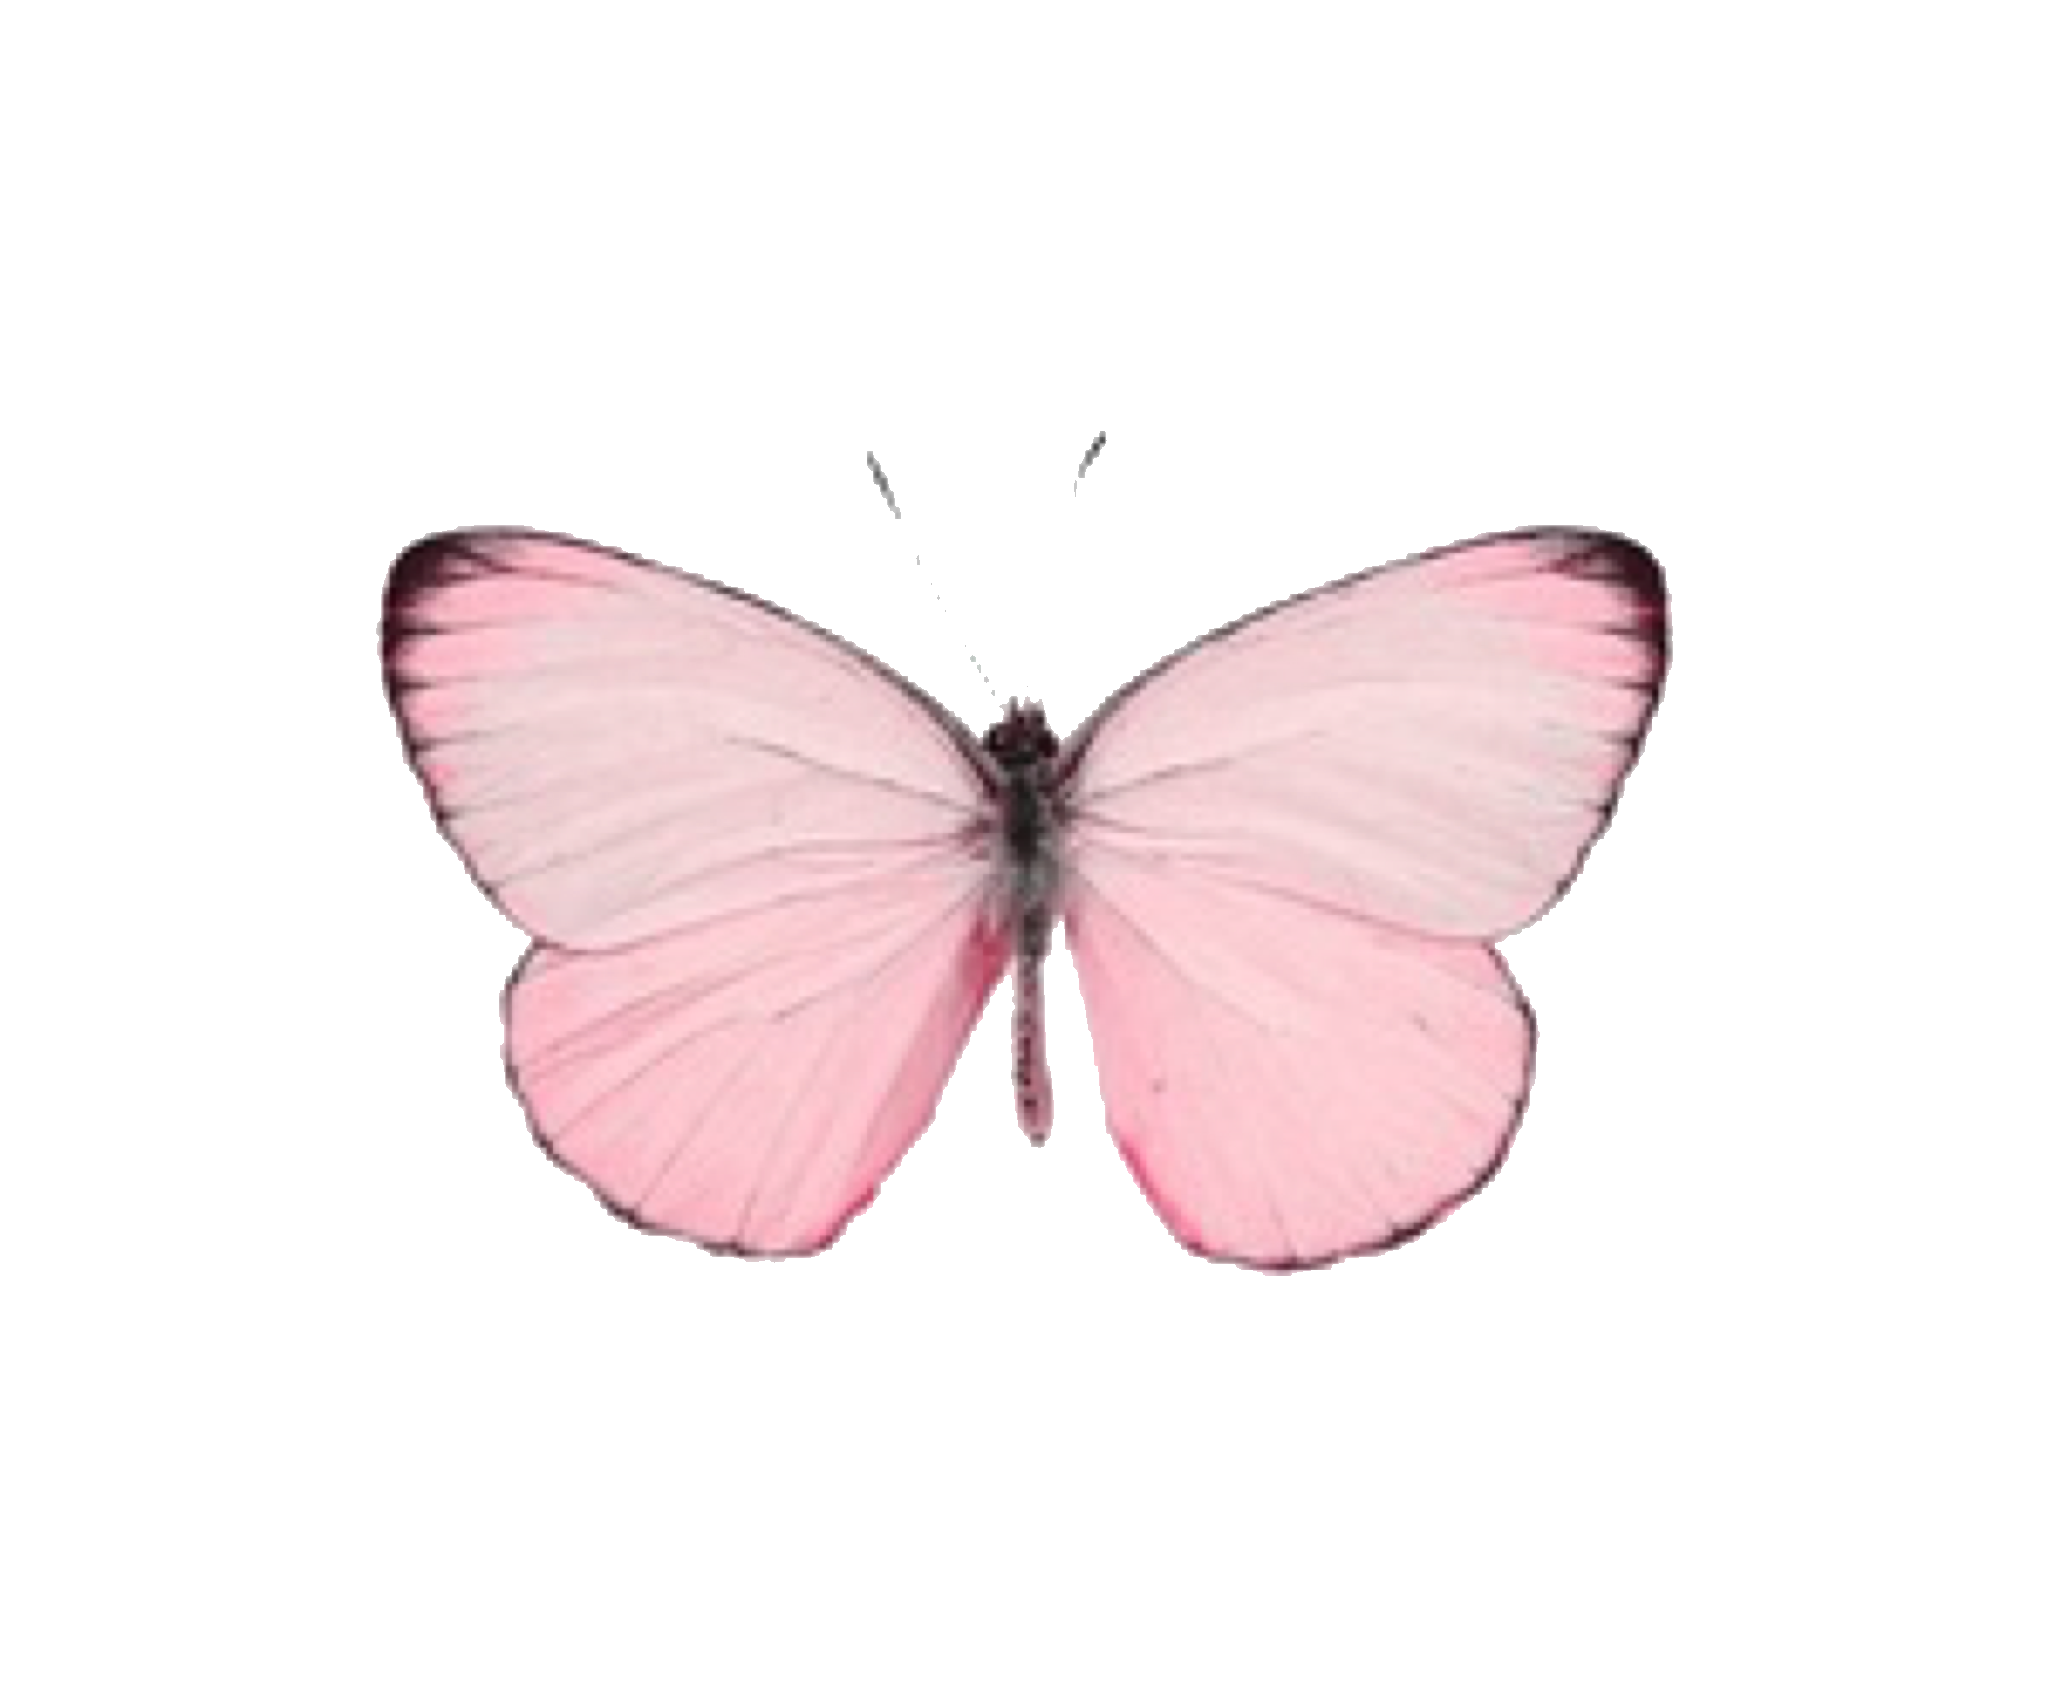 Pink Butterfly Pinkbutterfly Cute Girly Tumblr Aesthetic Bug Remix Freetoedit Remixit Pastel Pink Aesthetic Butterfly Photos Emoji Images